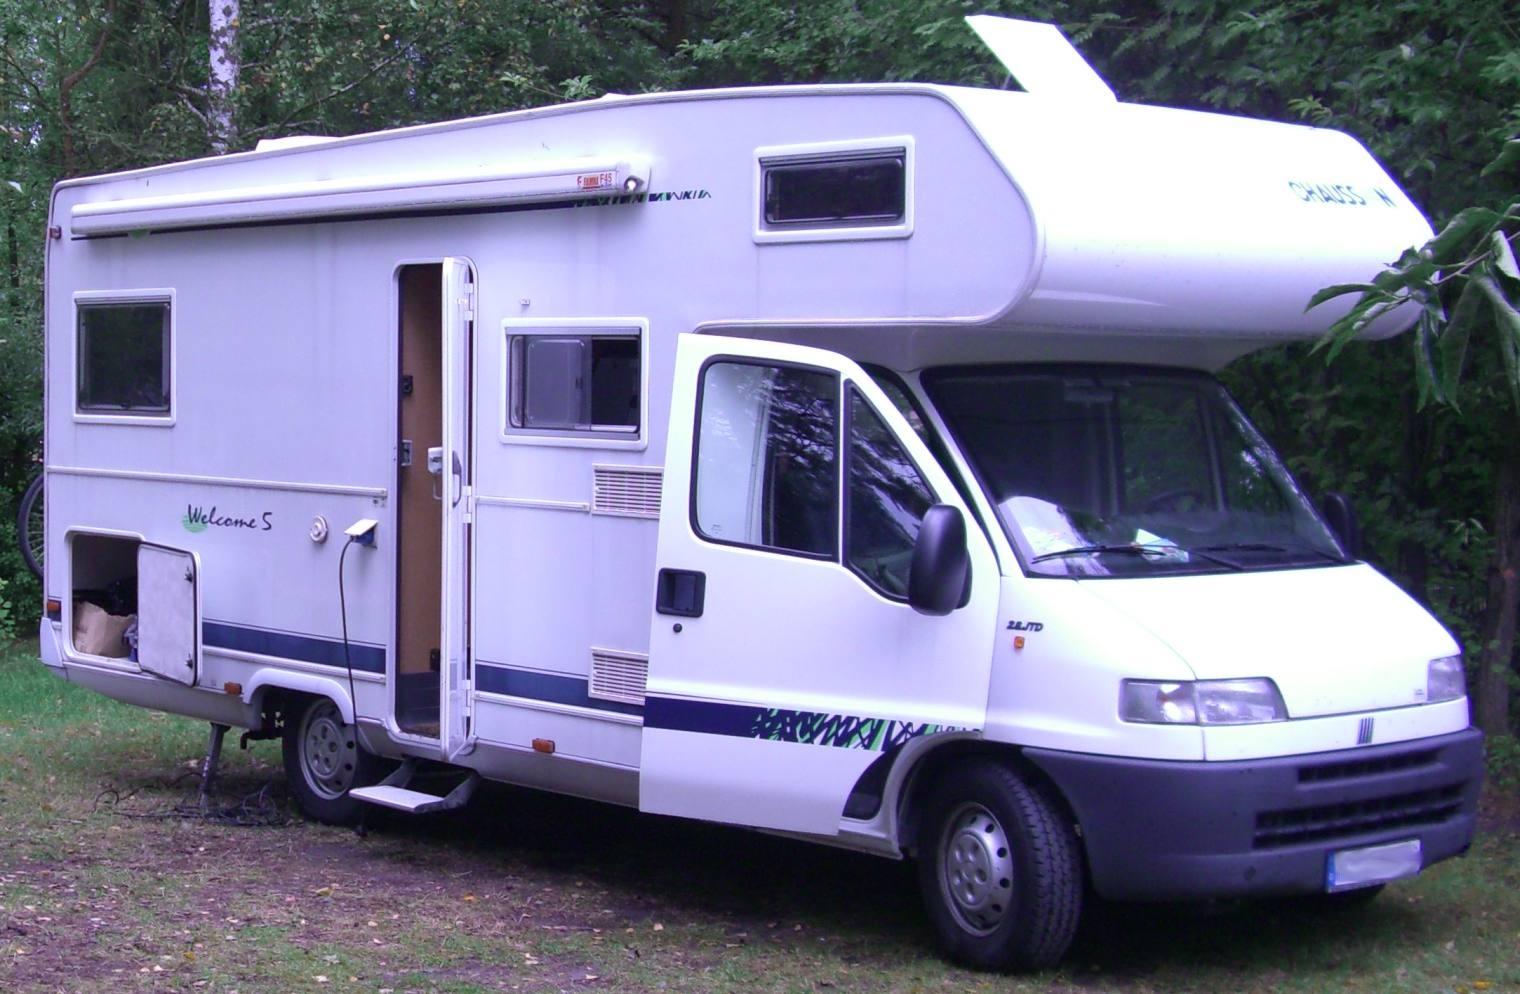 wohnmobil finanzierung wohnmobil camping infoportal. Black Bedroom Furniture Sets. Home Design Ideas